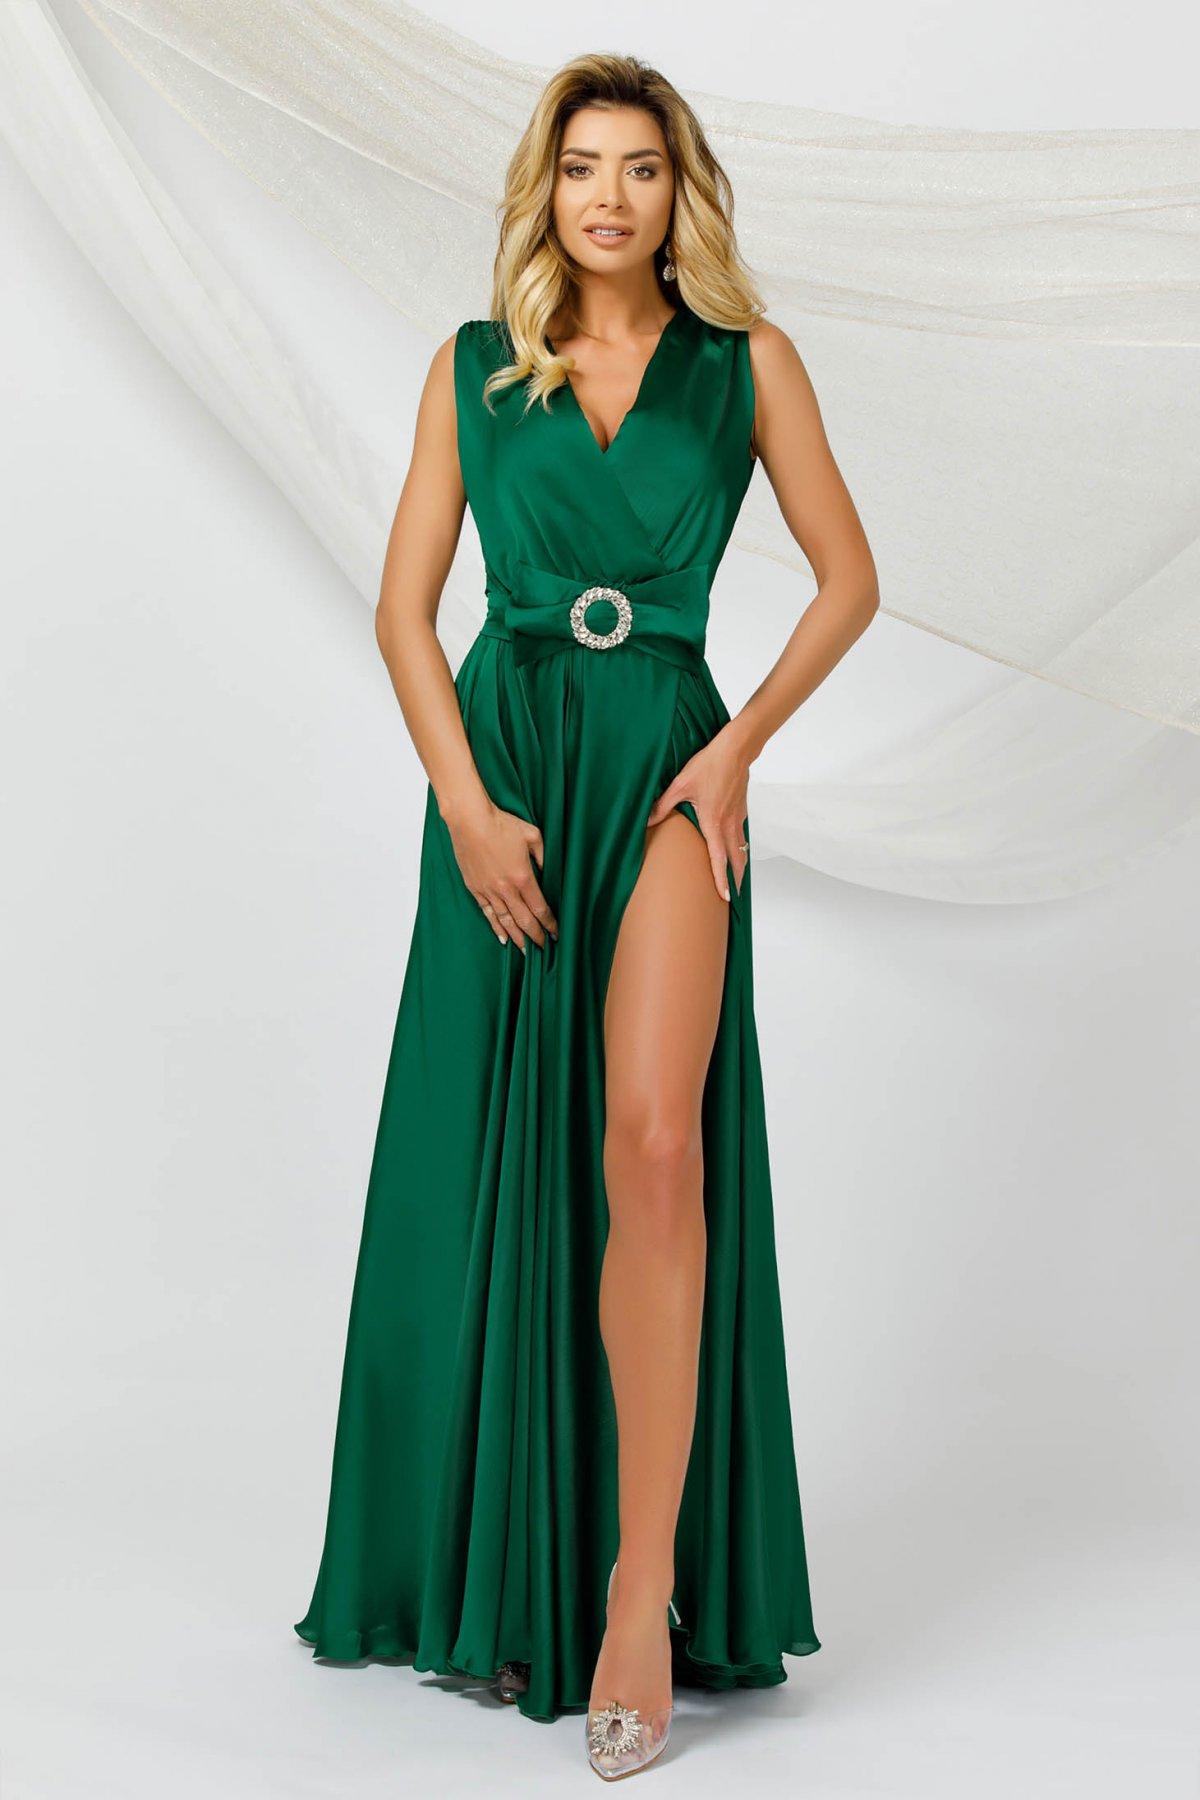 Rochie PrettyGirl verde lunga de ocazie in clos din voal din material satinat fara maneci